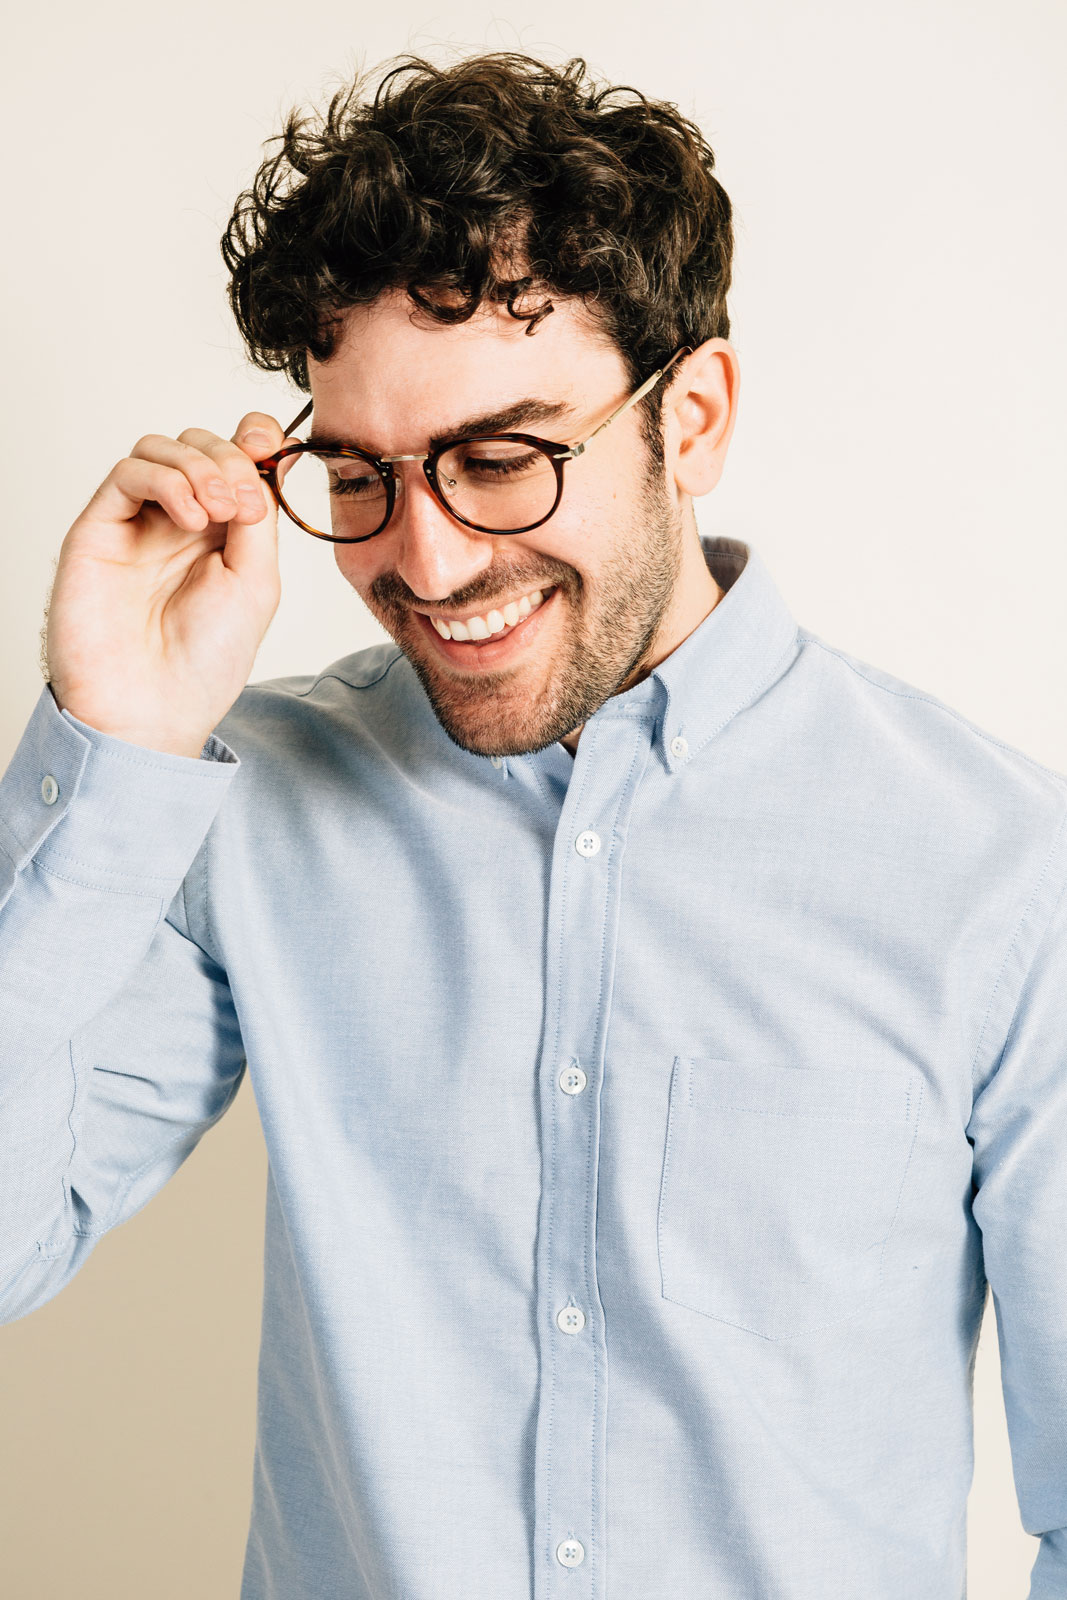 Watson chemise oxford portrait